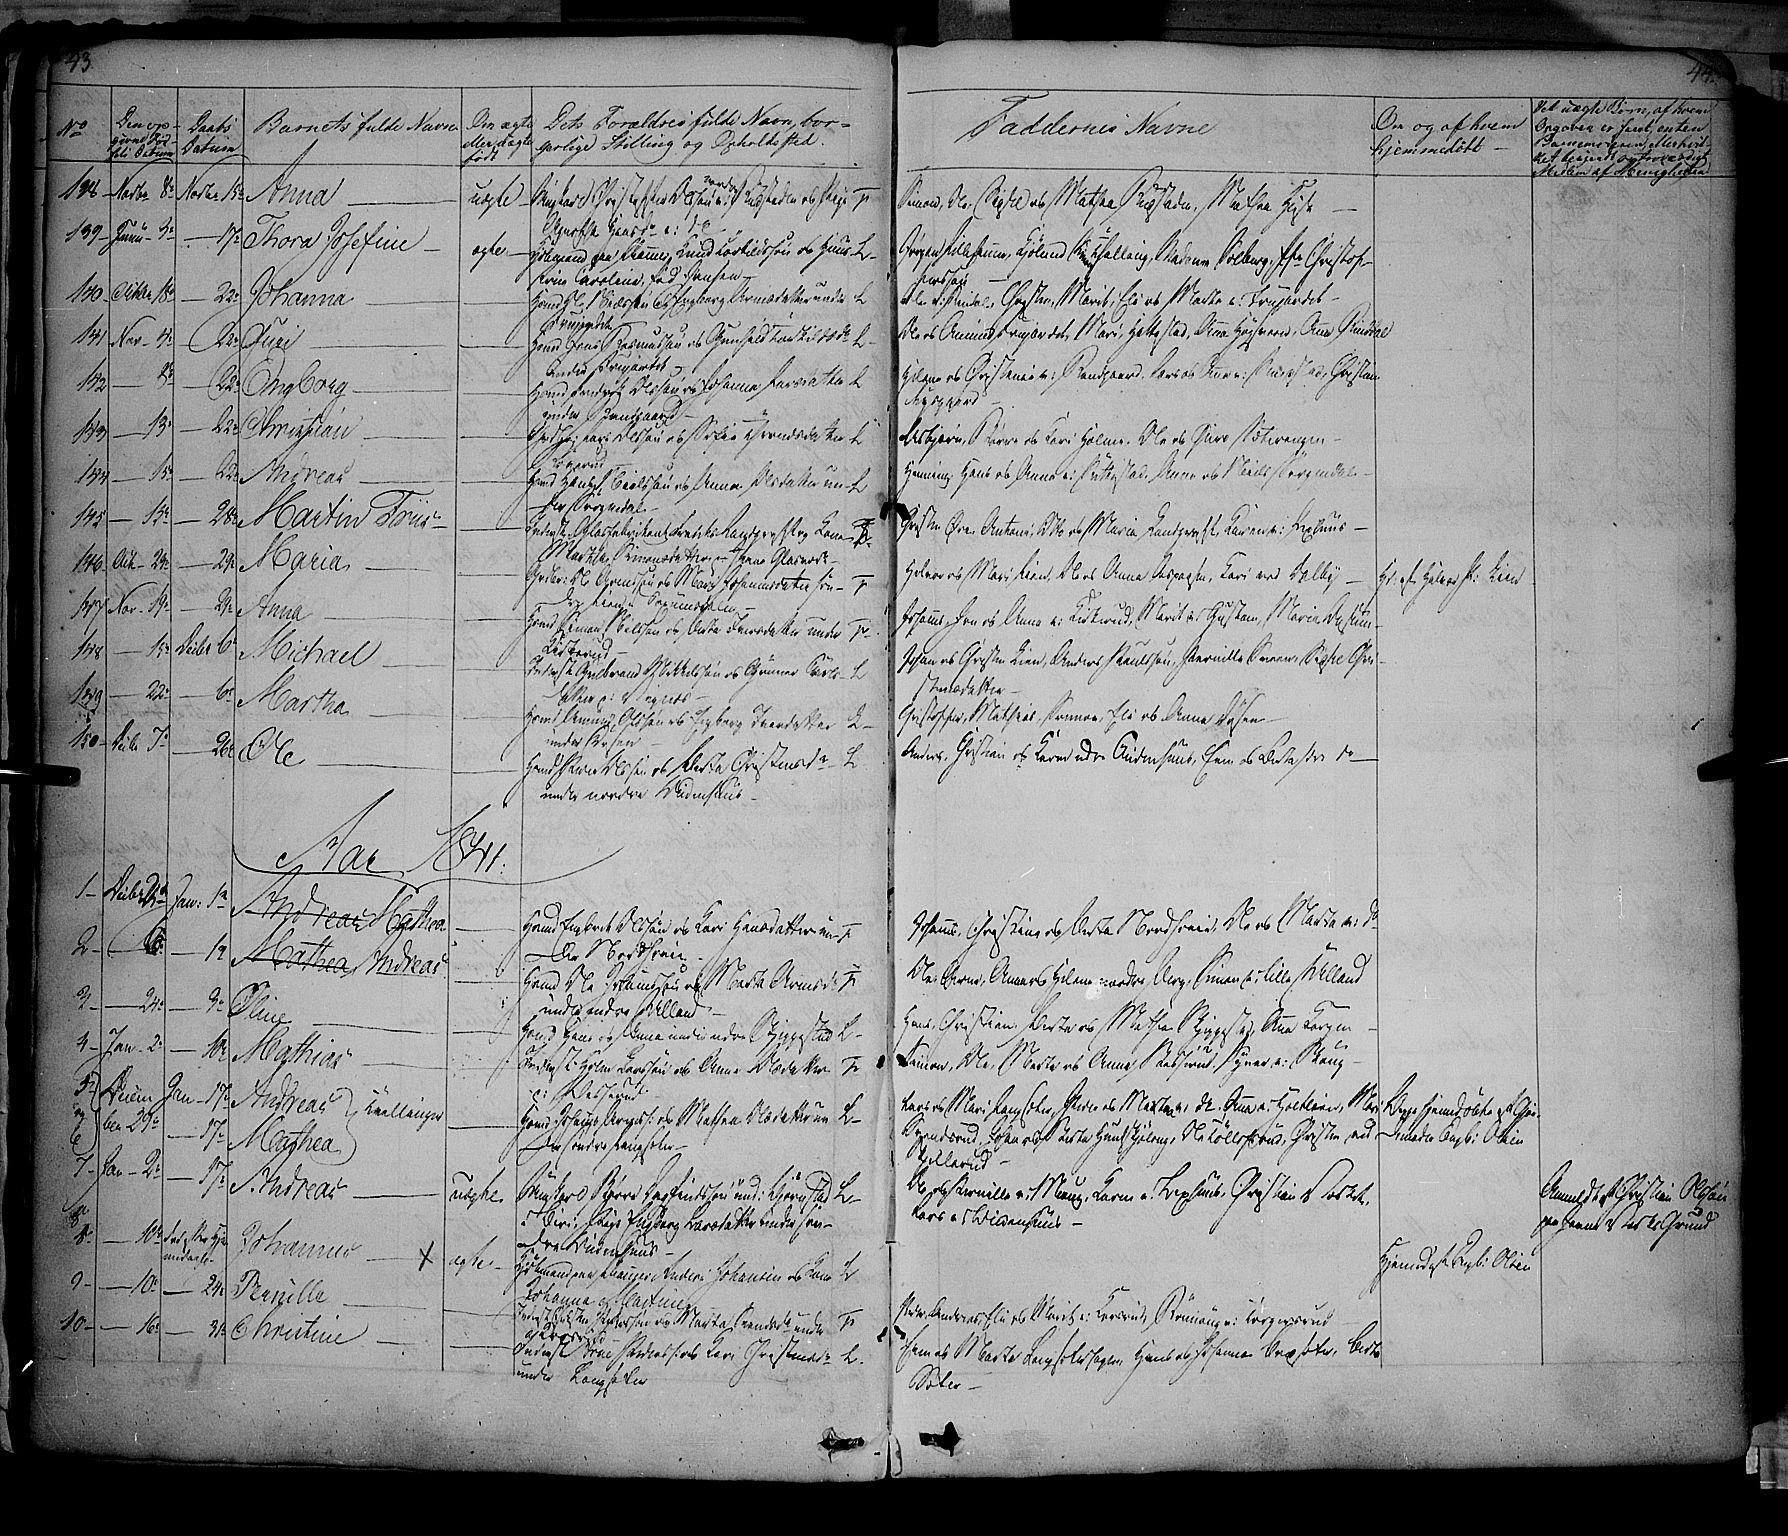 SAH, Fåberg prestekontor, Ministerialbok nr. 5, 1836-1854, s. 43-44